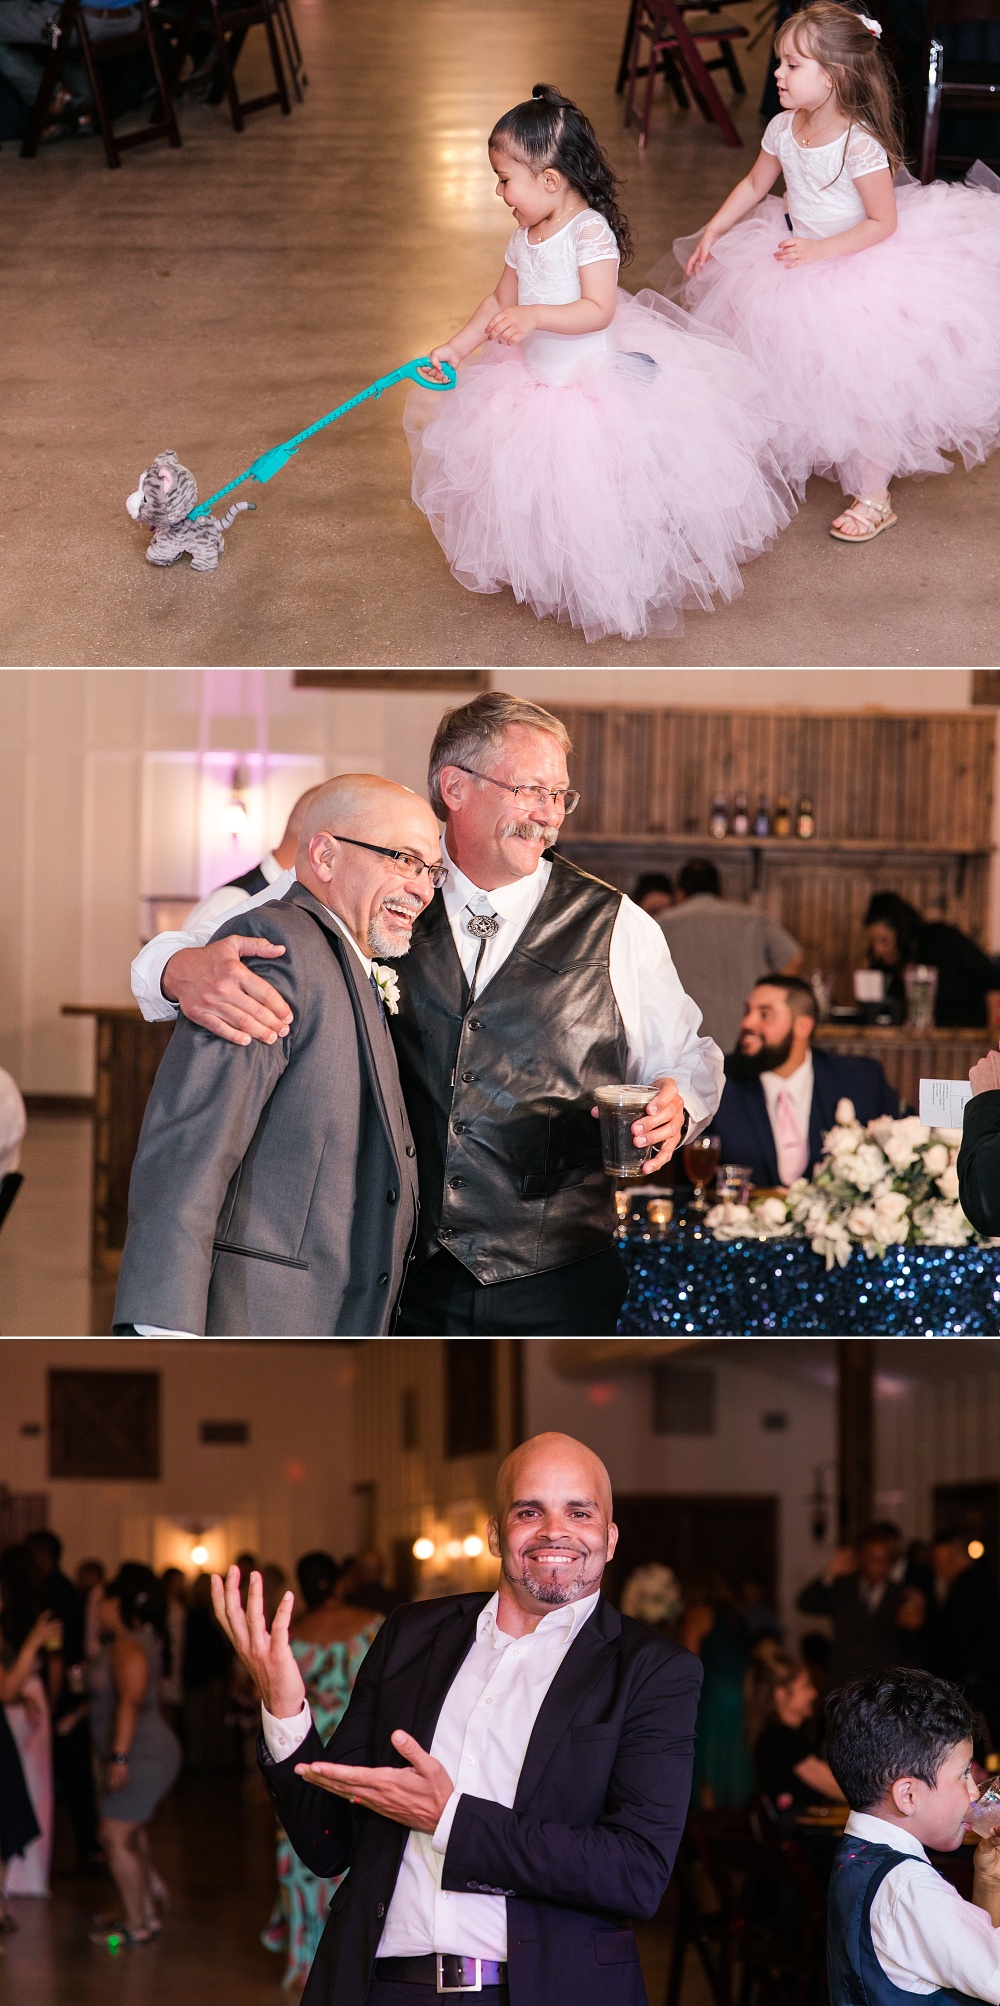 Wedding-Photographer-Bulverde-Texas-Western-Sky-Event-Venue-Carly-Barton-Photography_0059.jpg